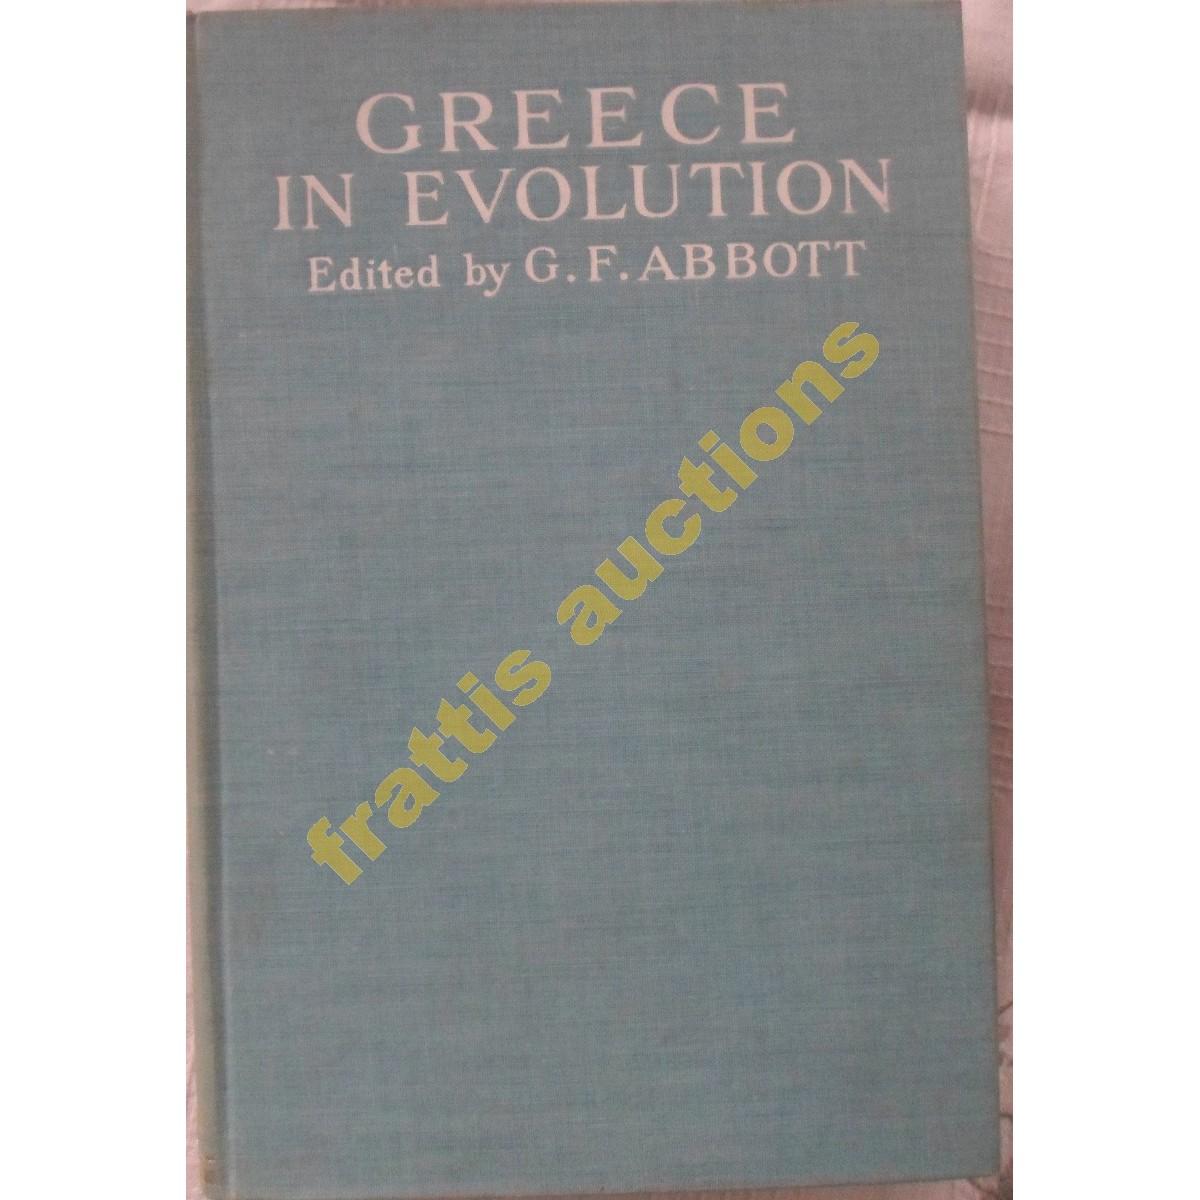 G.F.Abbot, Greece in Evolution. 1909 .